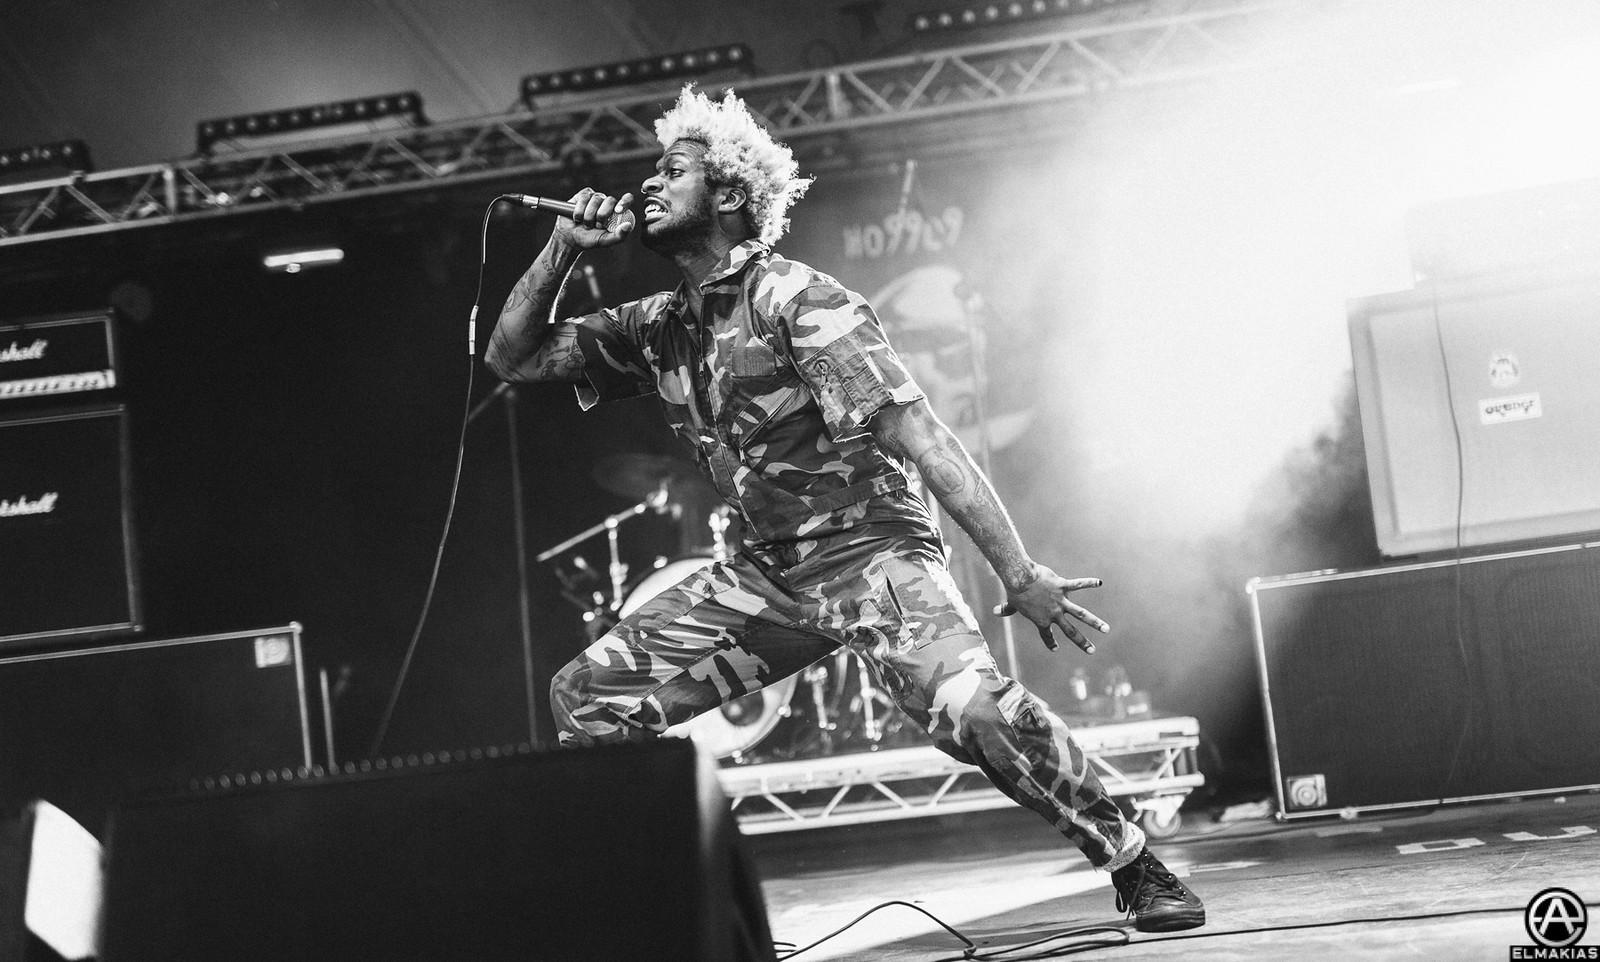 Eaddy of Ho99o9 live at Reading Festival 2015 by Adam Elmakias